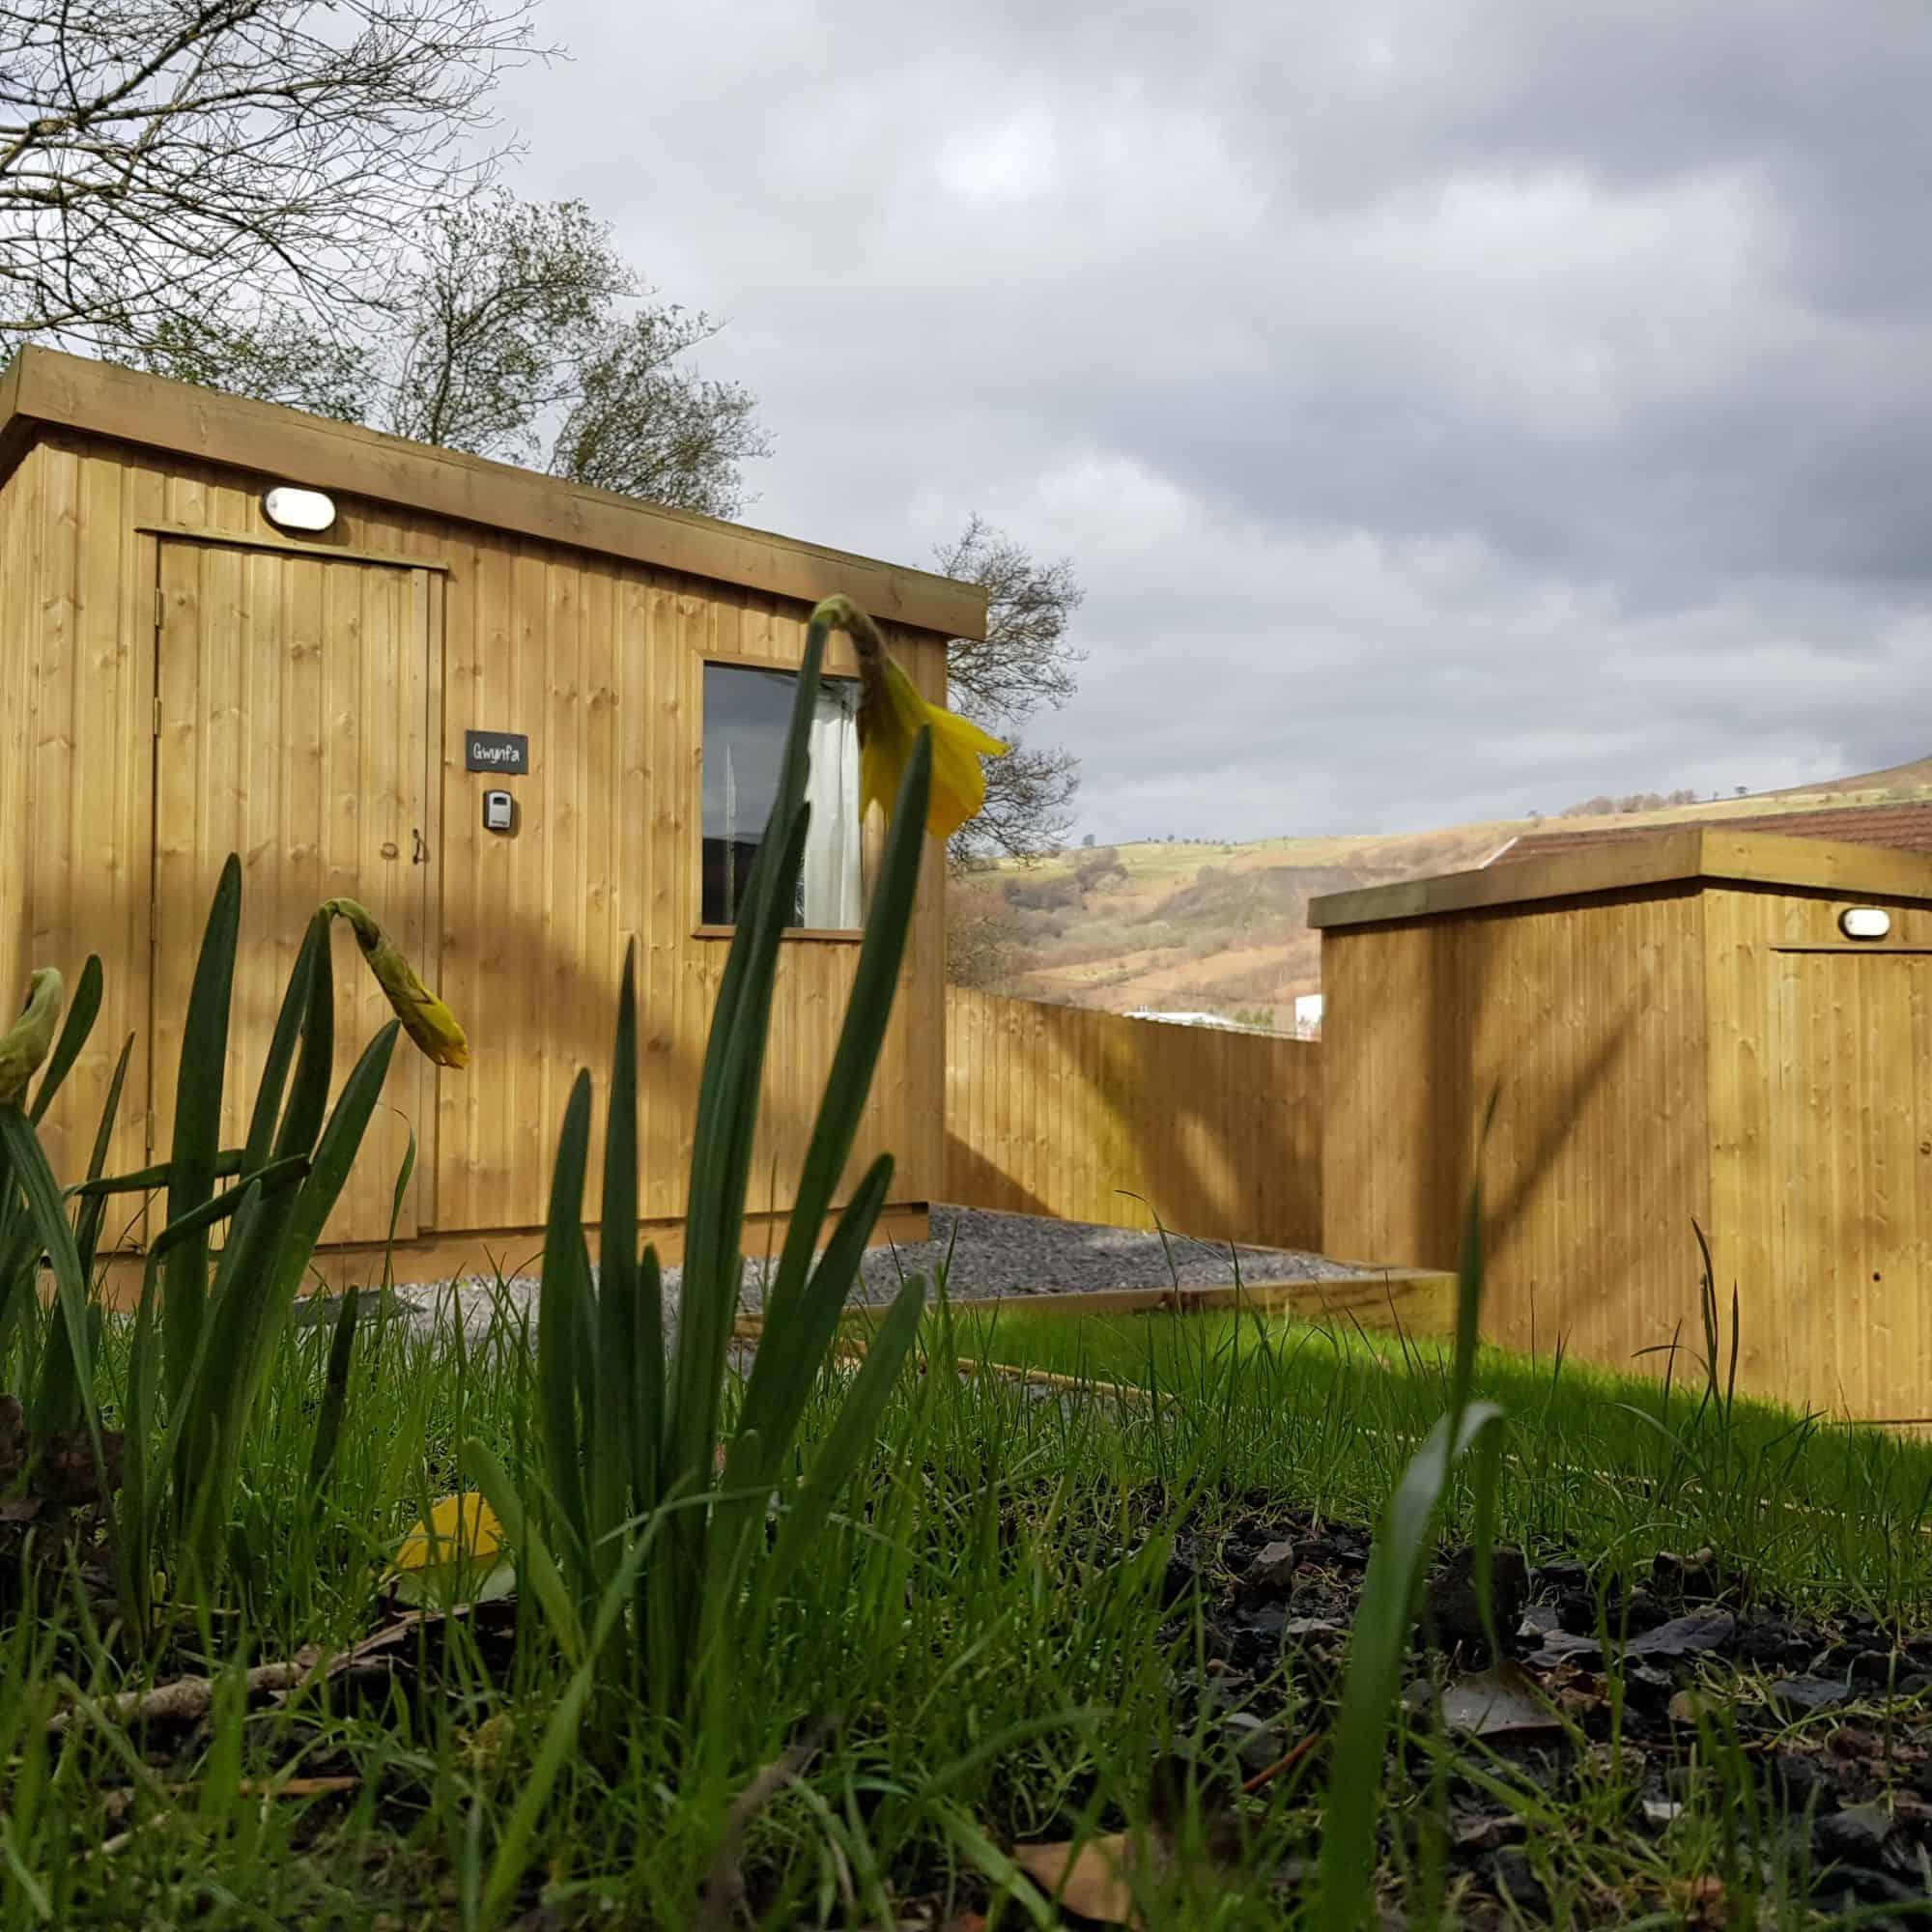 Cabin viewed through daffodils